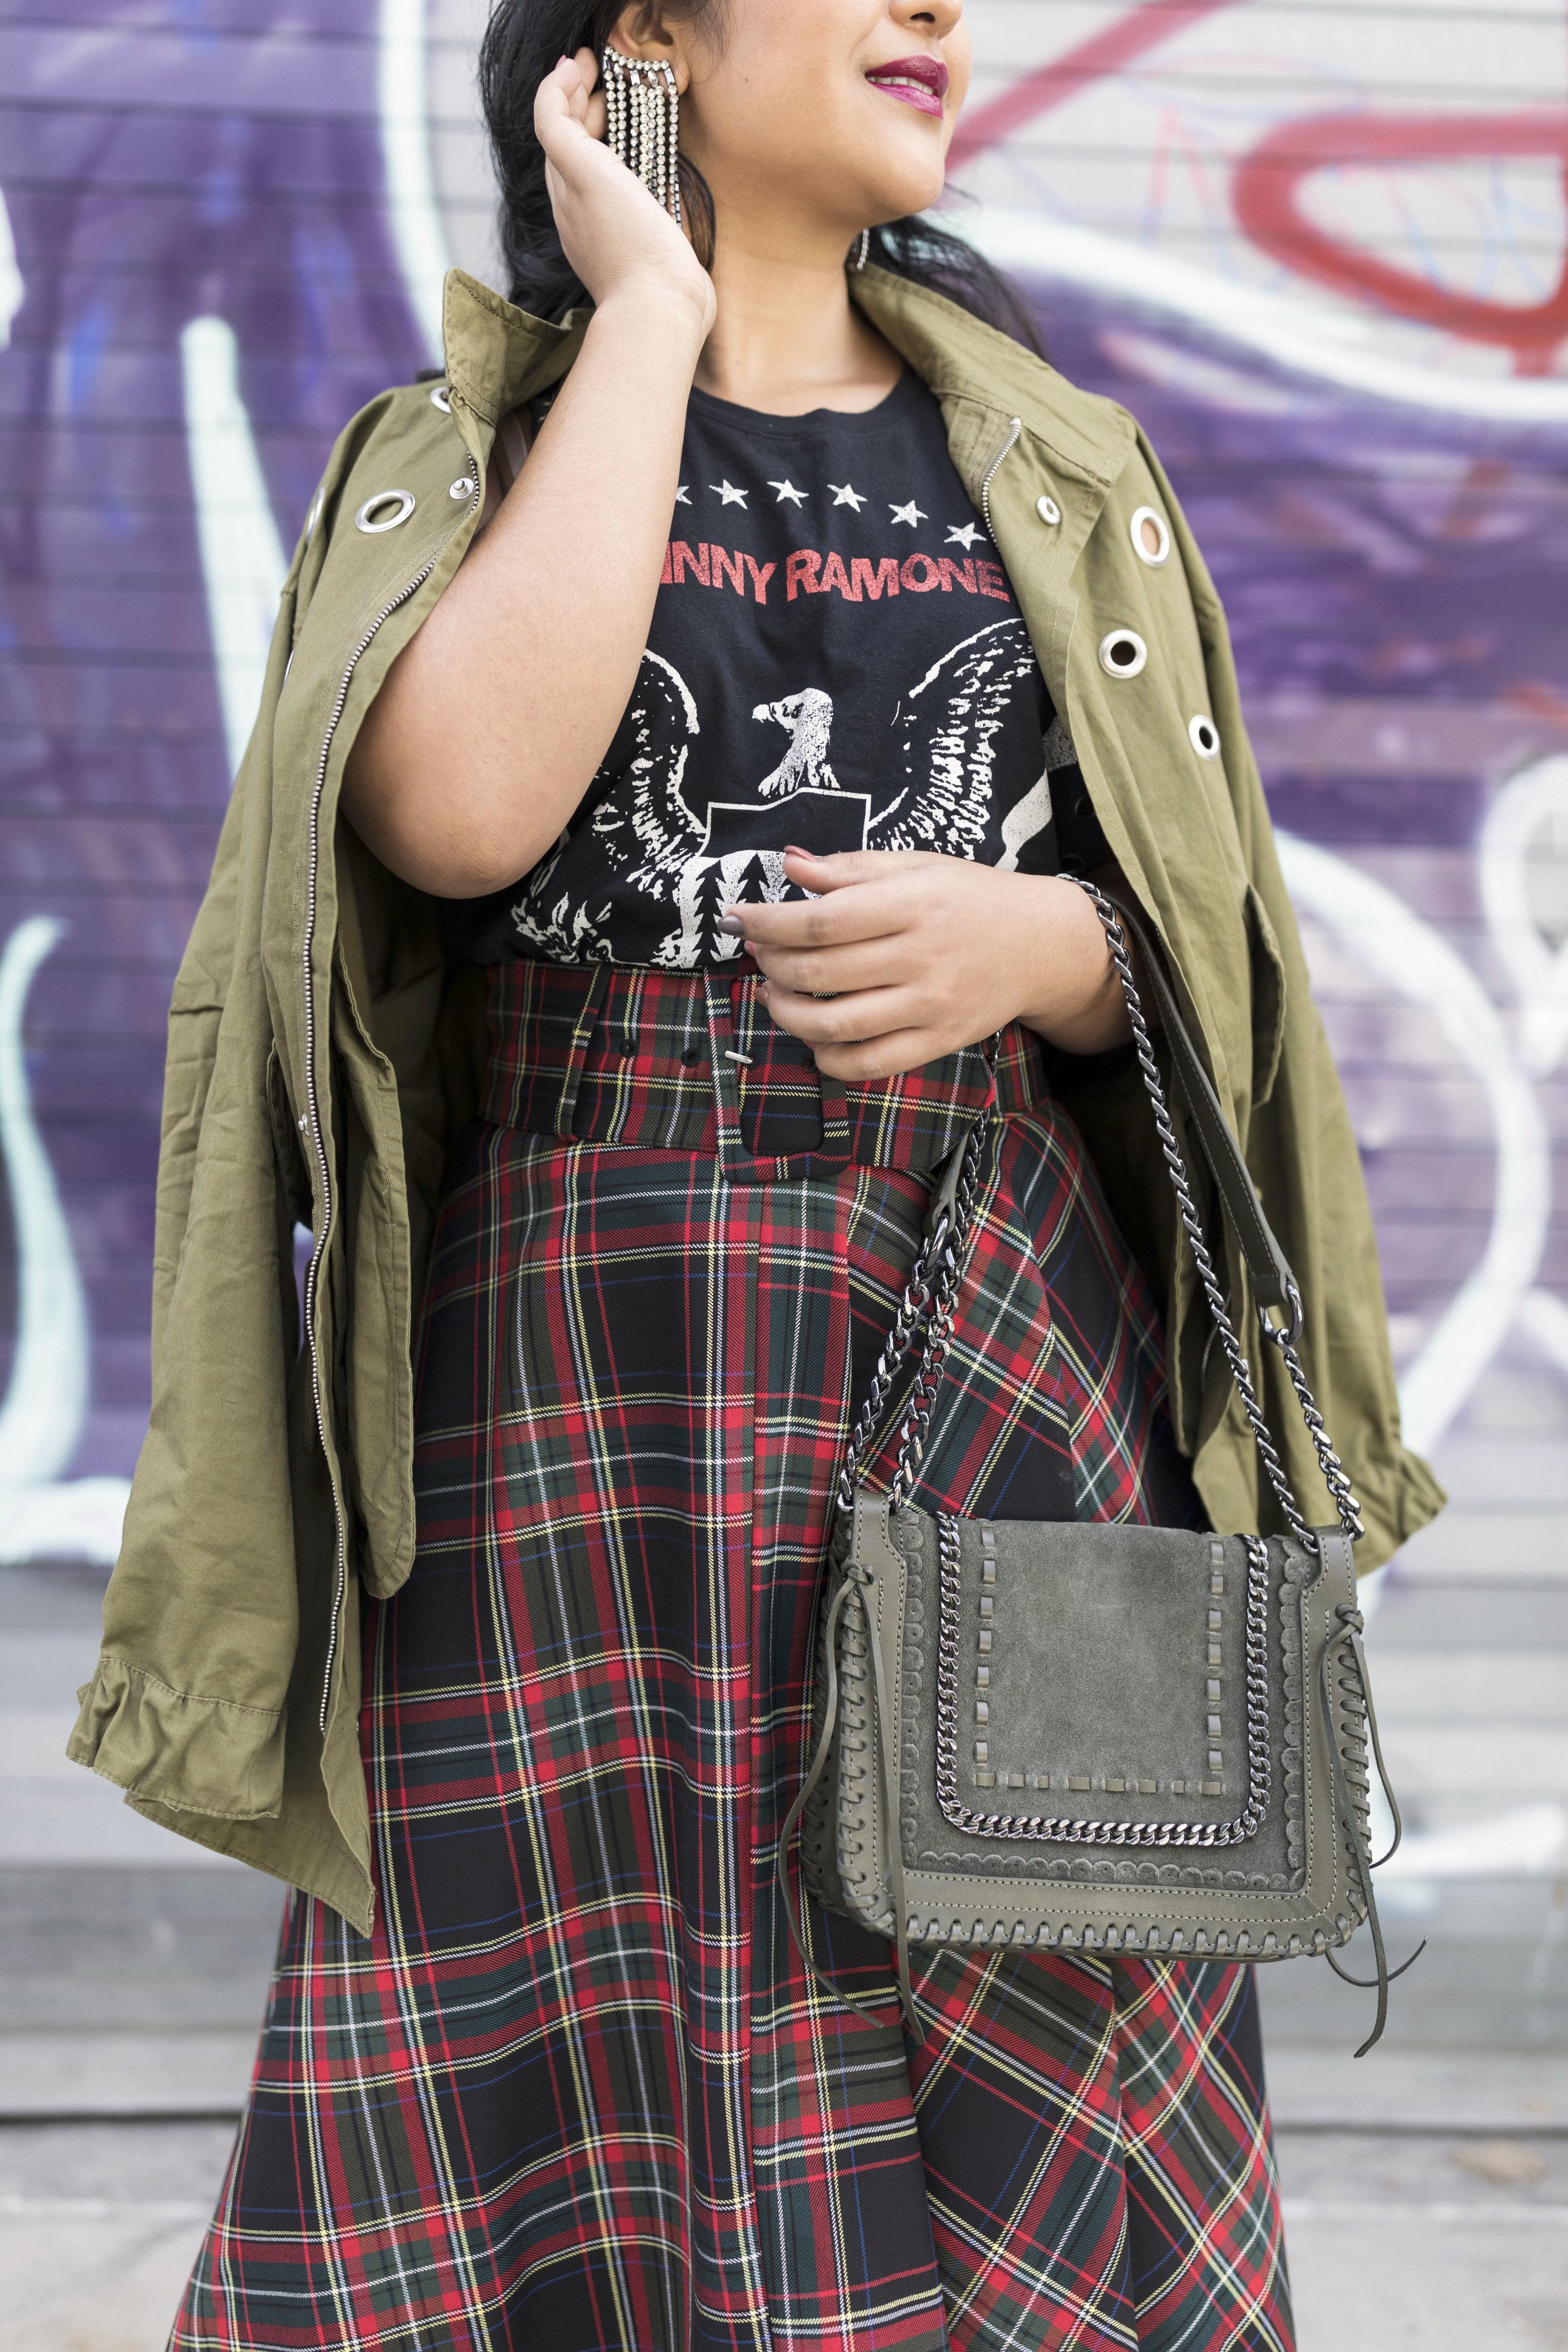 Krity S x Fall Trends x Plaid with a Punk Twist13.jpg